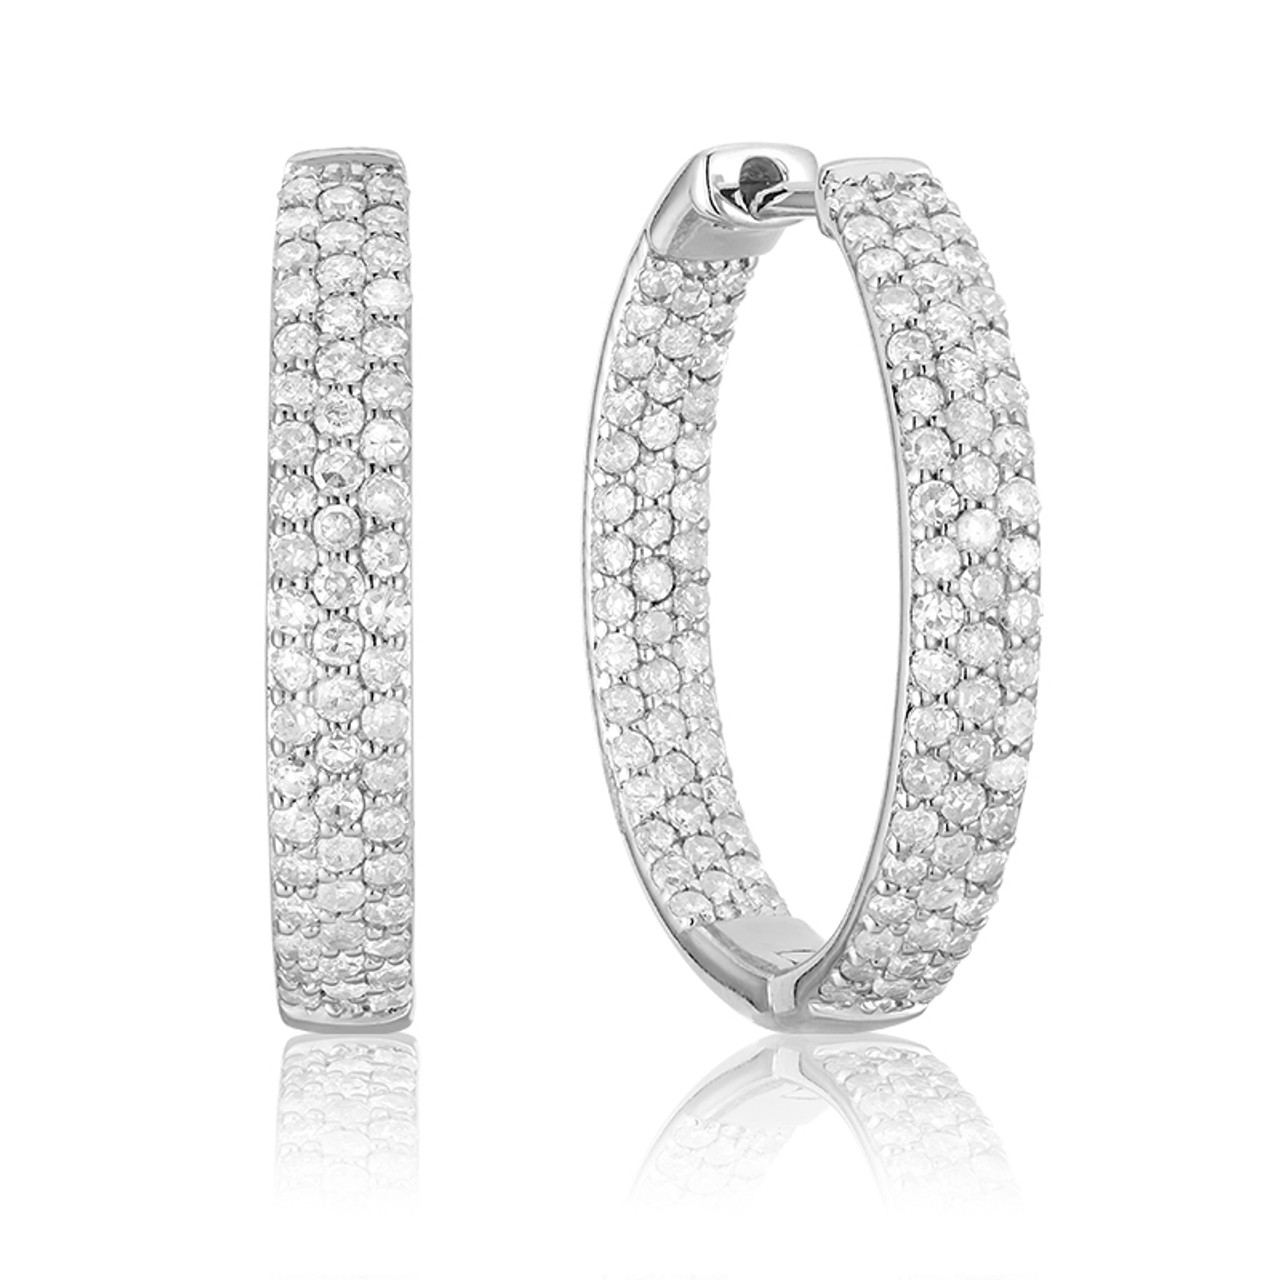 25b17ceafbeb4 DIAMOND LOOPS EARRING #13-040090